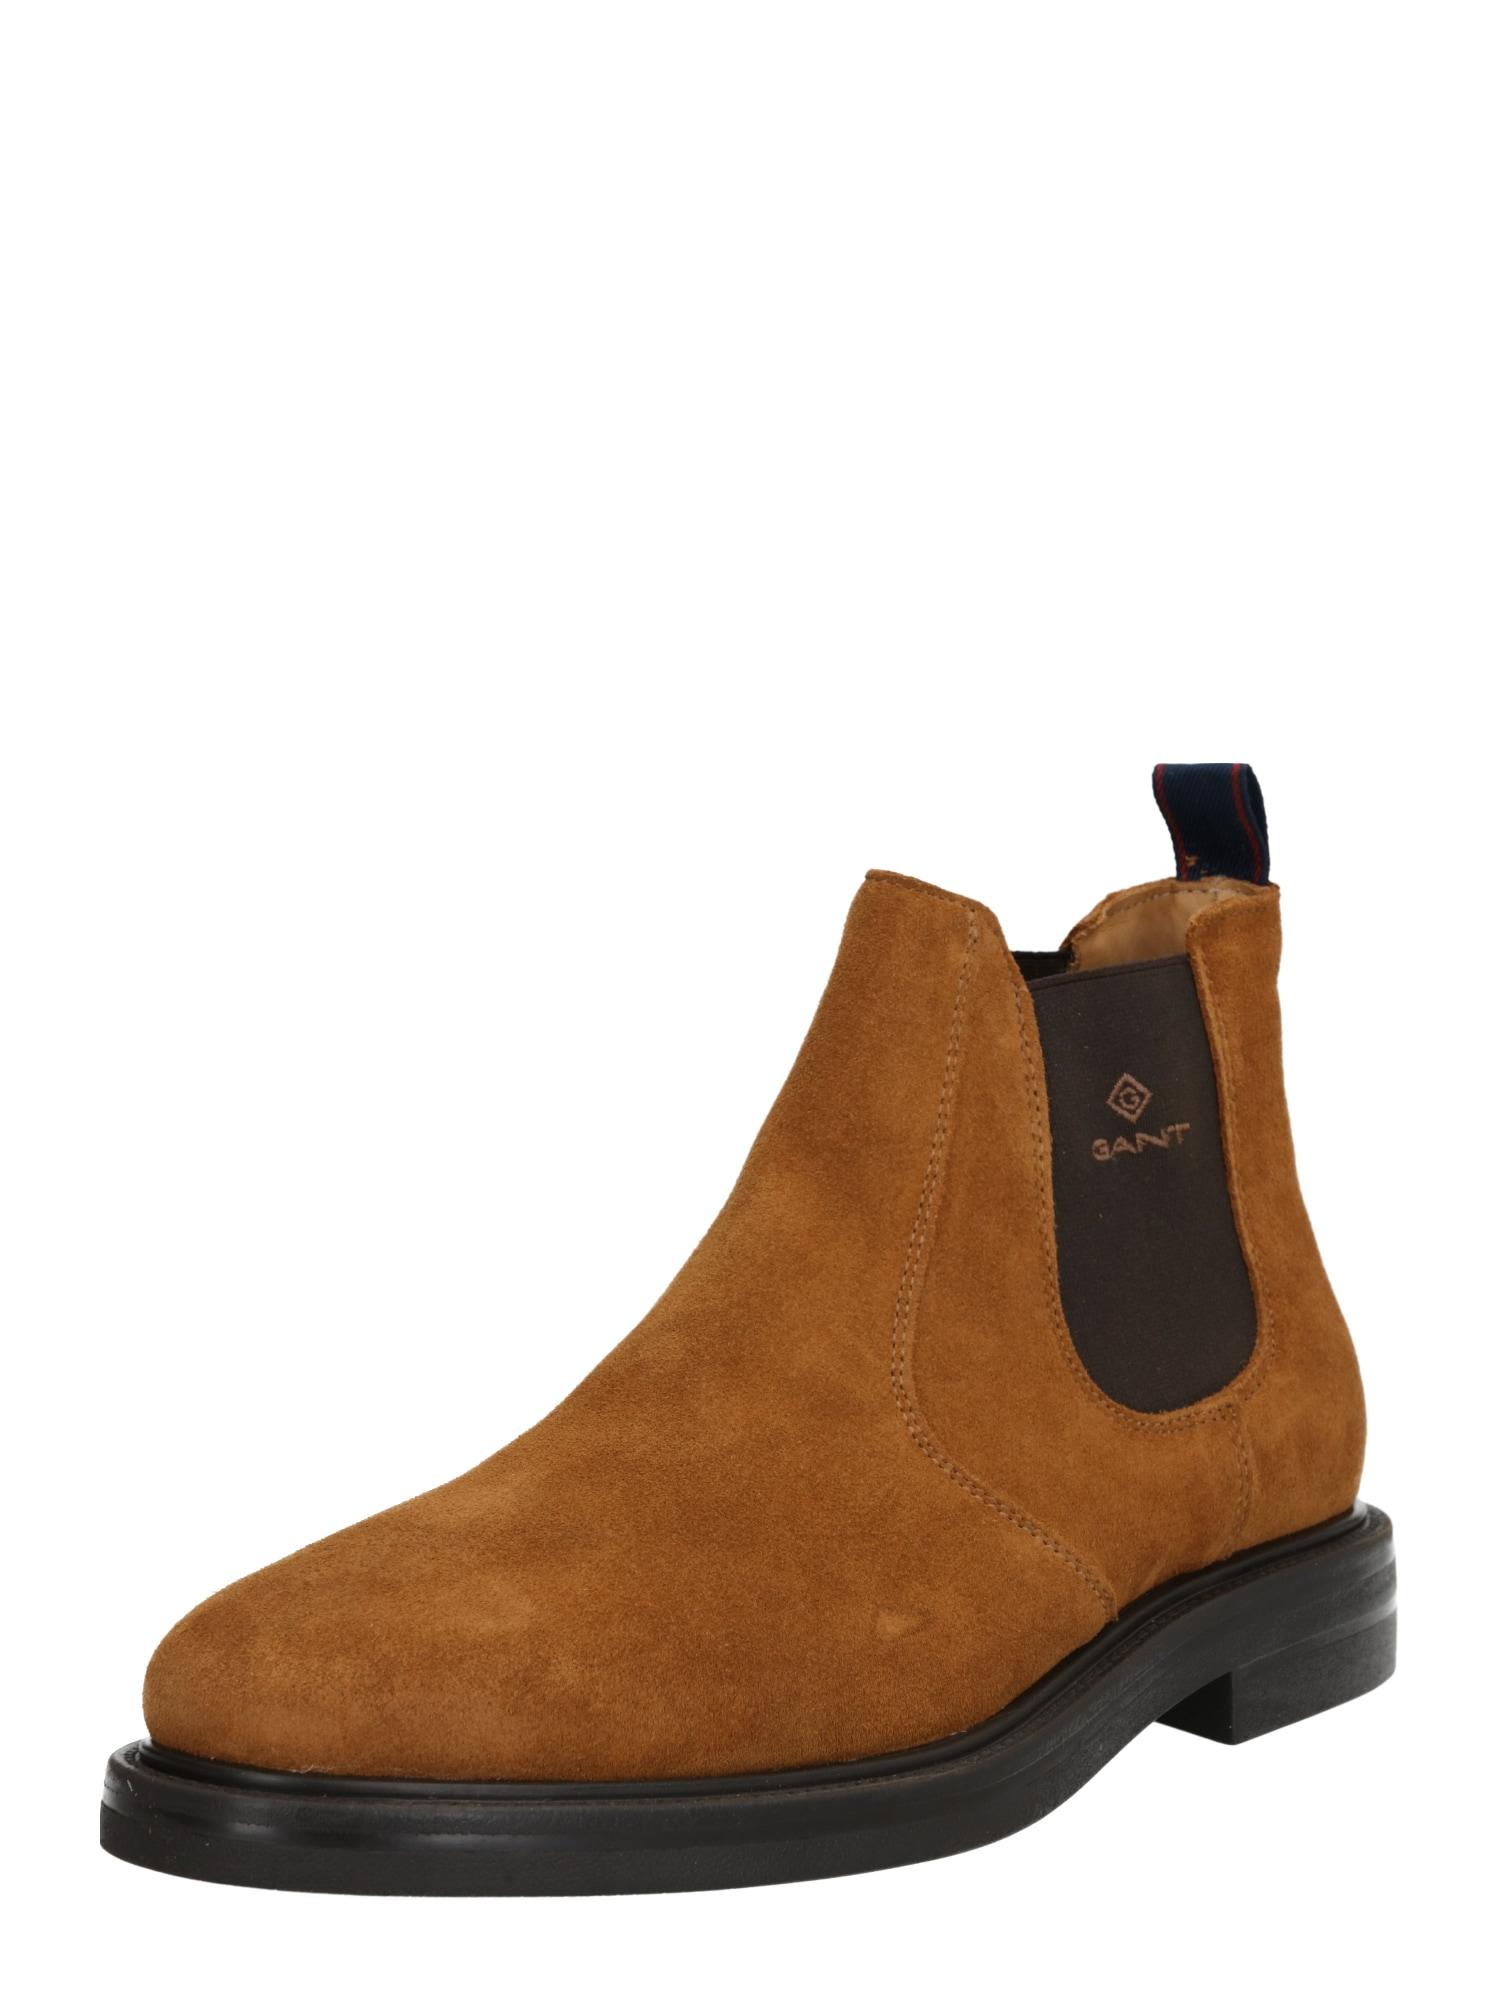 Chelsea Boots 'Fargo' | Schuhe > Boots > Chelsea-Boots | Gant